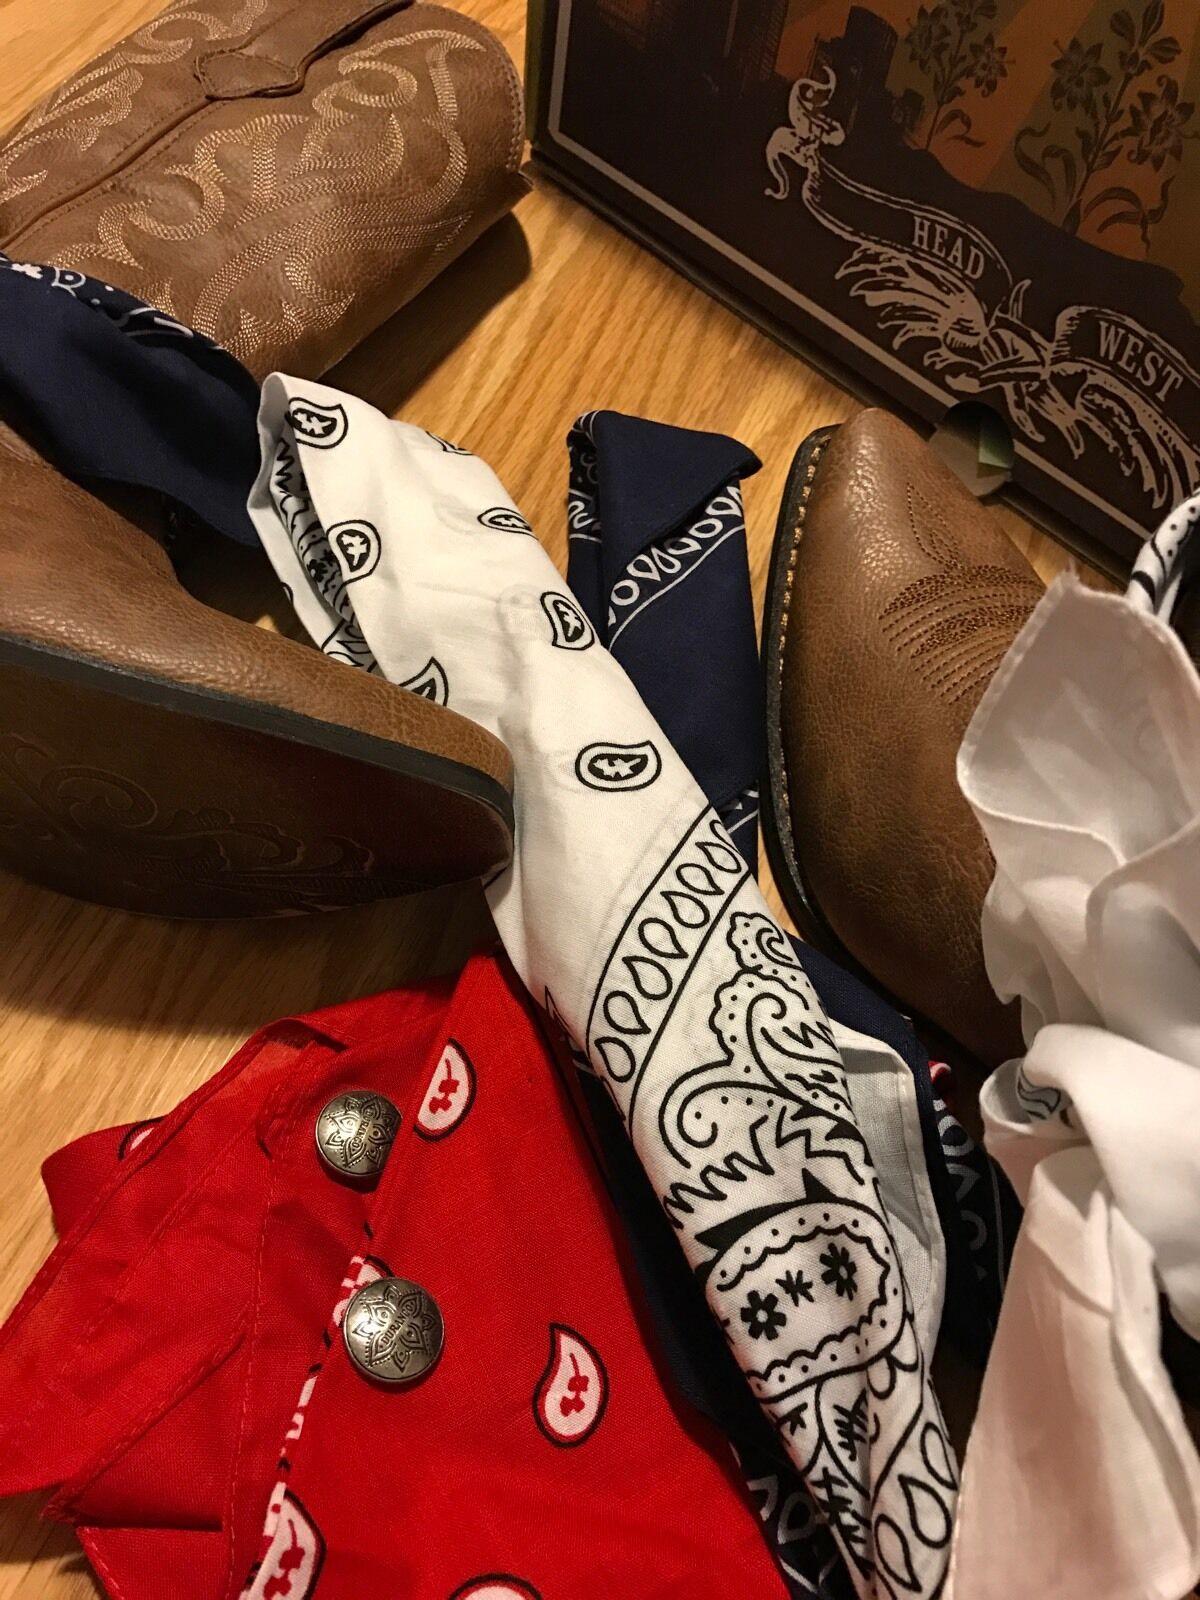 Durango Crush Brown Cowgirl Western Boots DRD0089 Women's Bandana 7.5 M